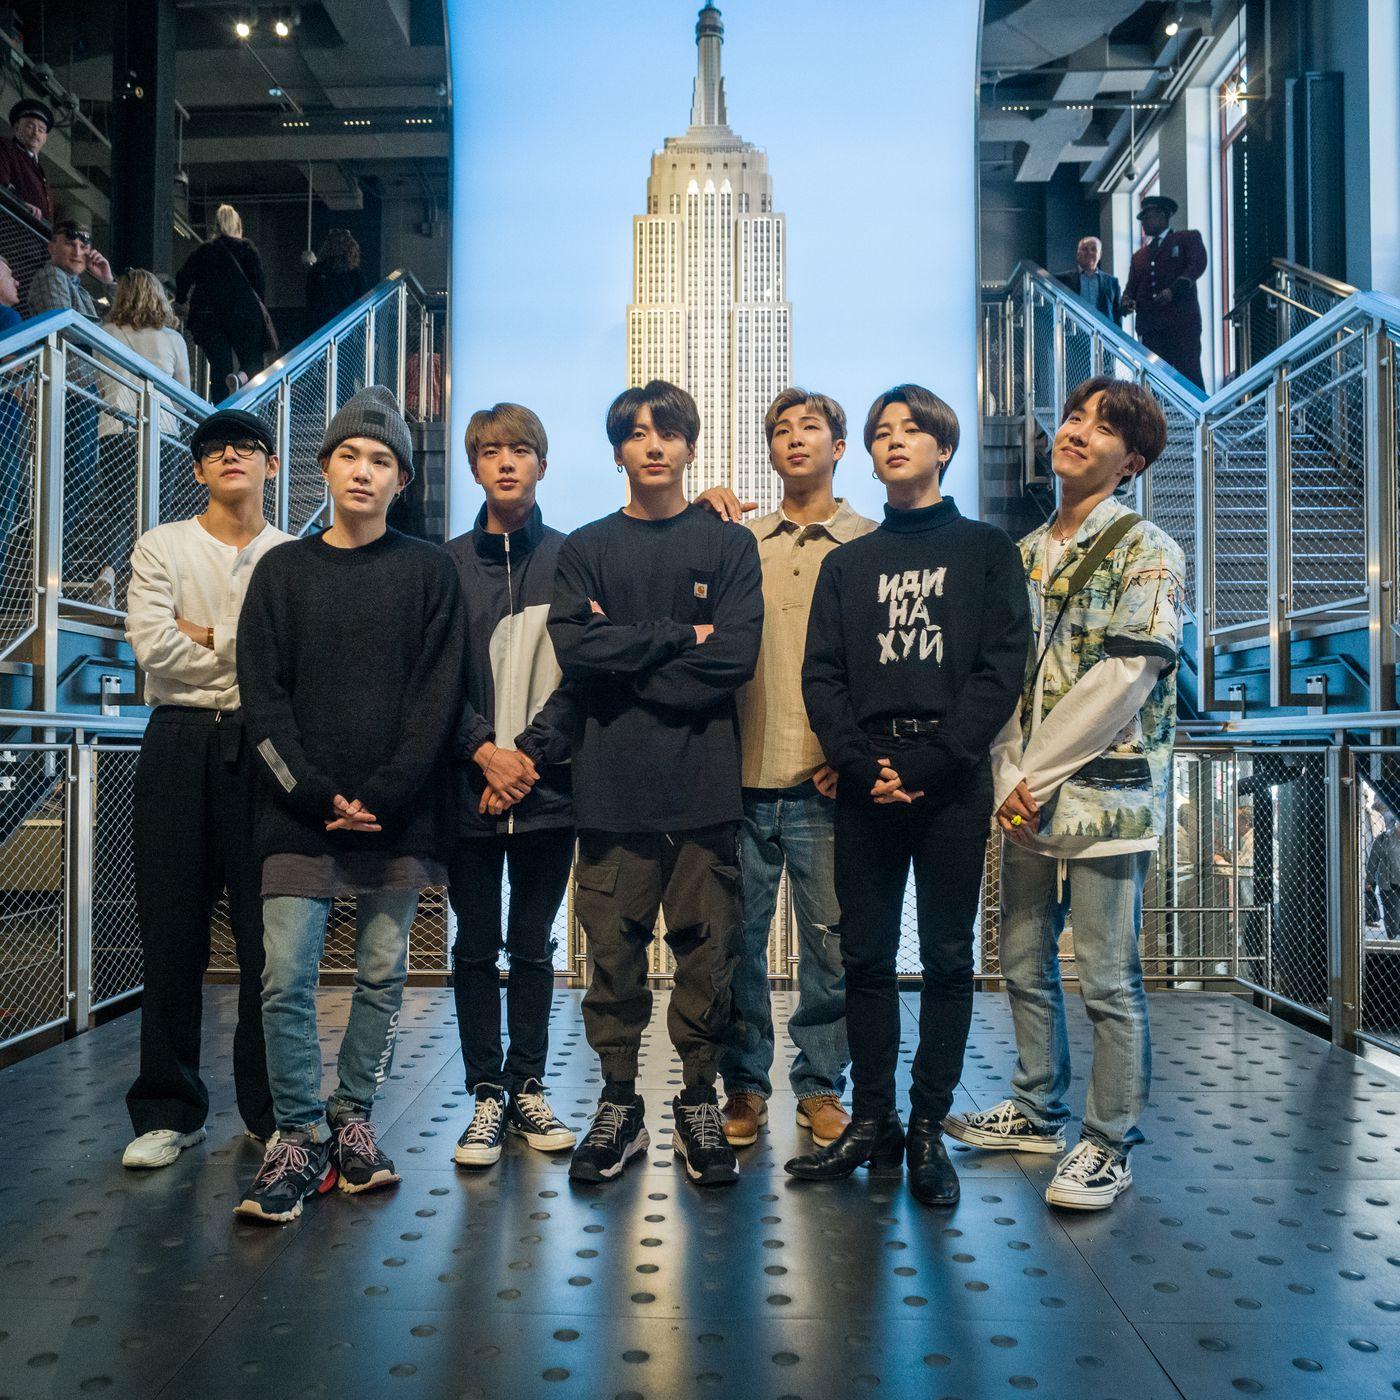 The VMAs' new K-pop category spawns backlash from BTS fans - Vox